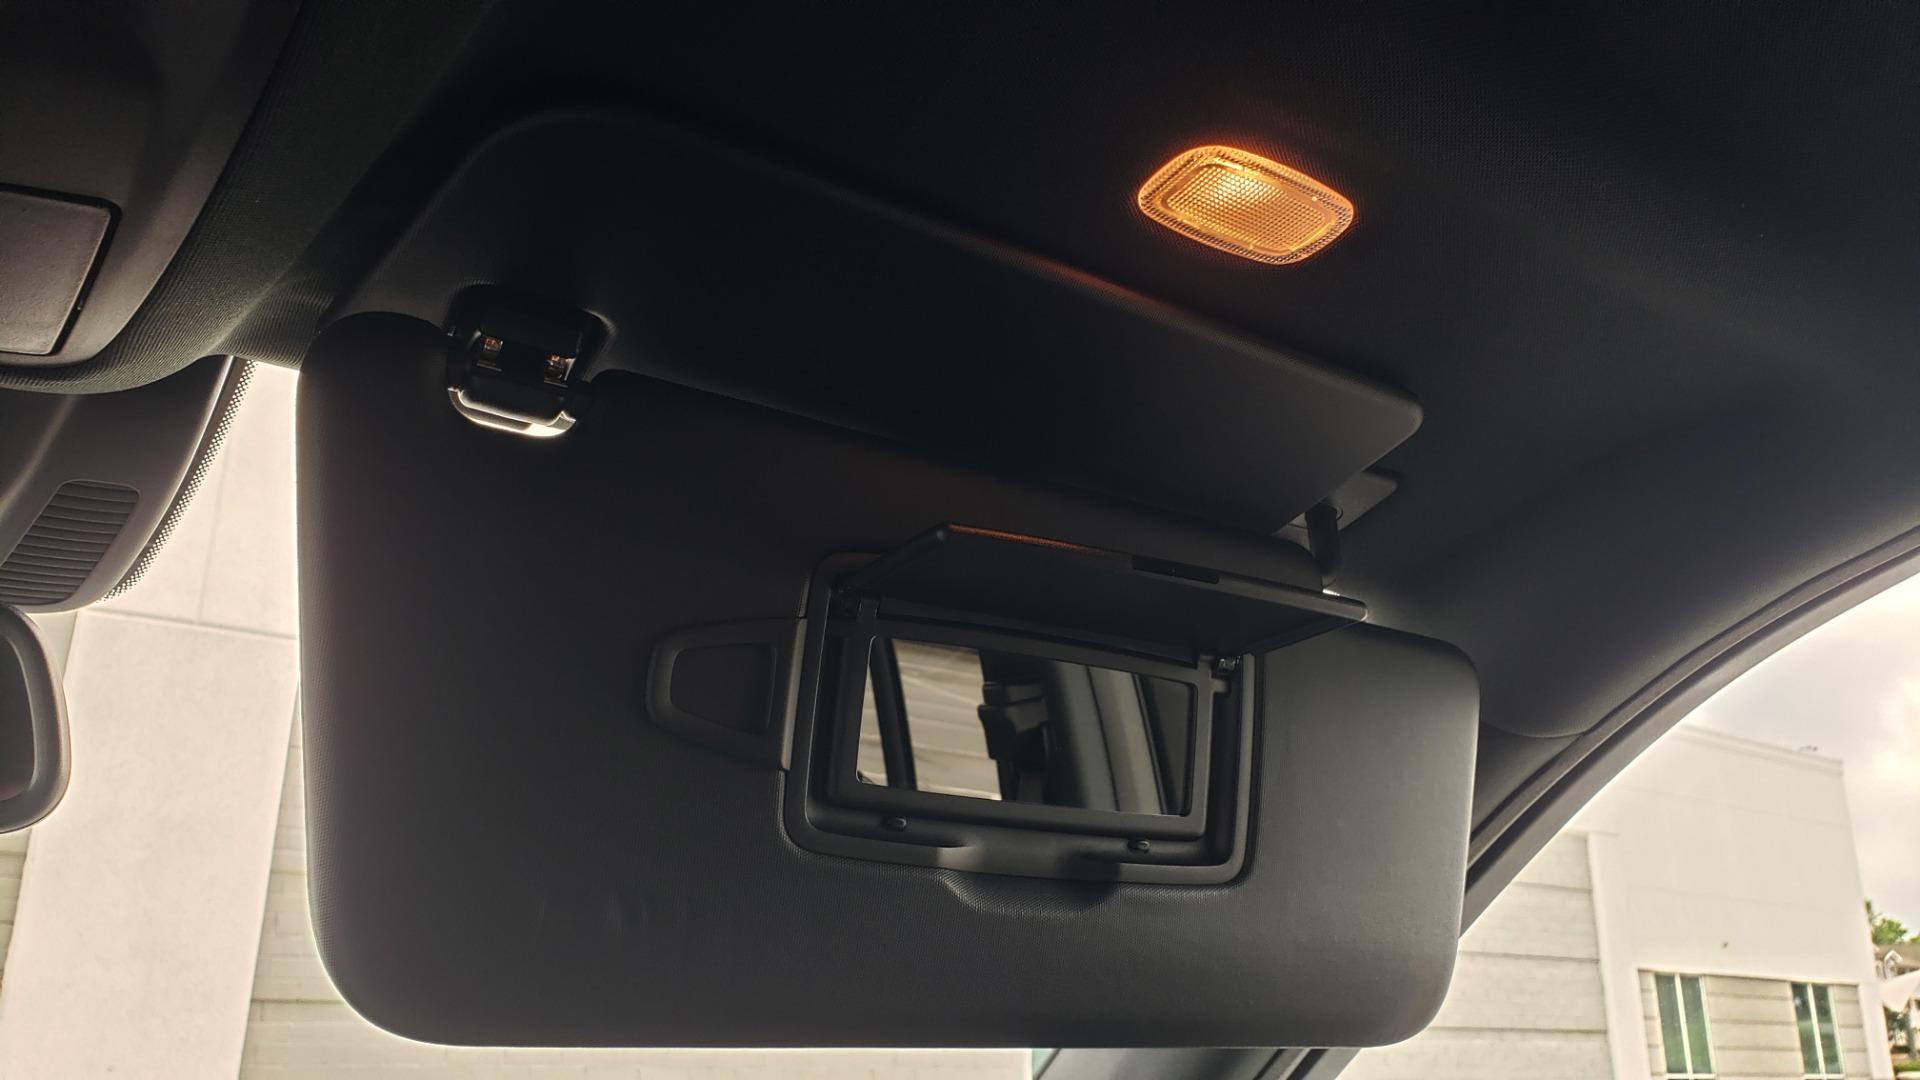 Used 2018 Mercedes-Benz GLE 350 4MATIC / PREM PKG / NAV / PARK ASST / K/H SND / HITCH / REARVIEW for sale $40,801 at Formula Imports in Charlotte NC 28227 54